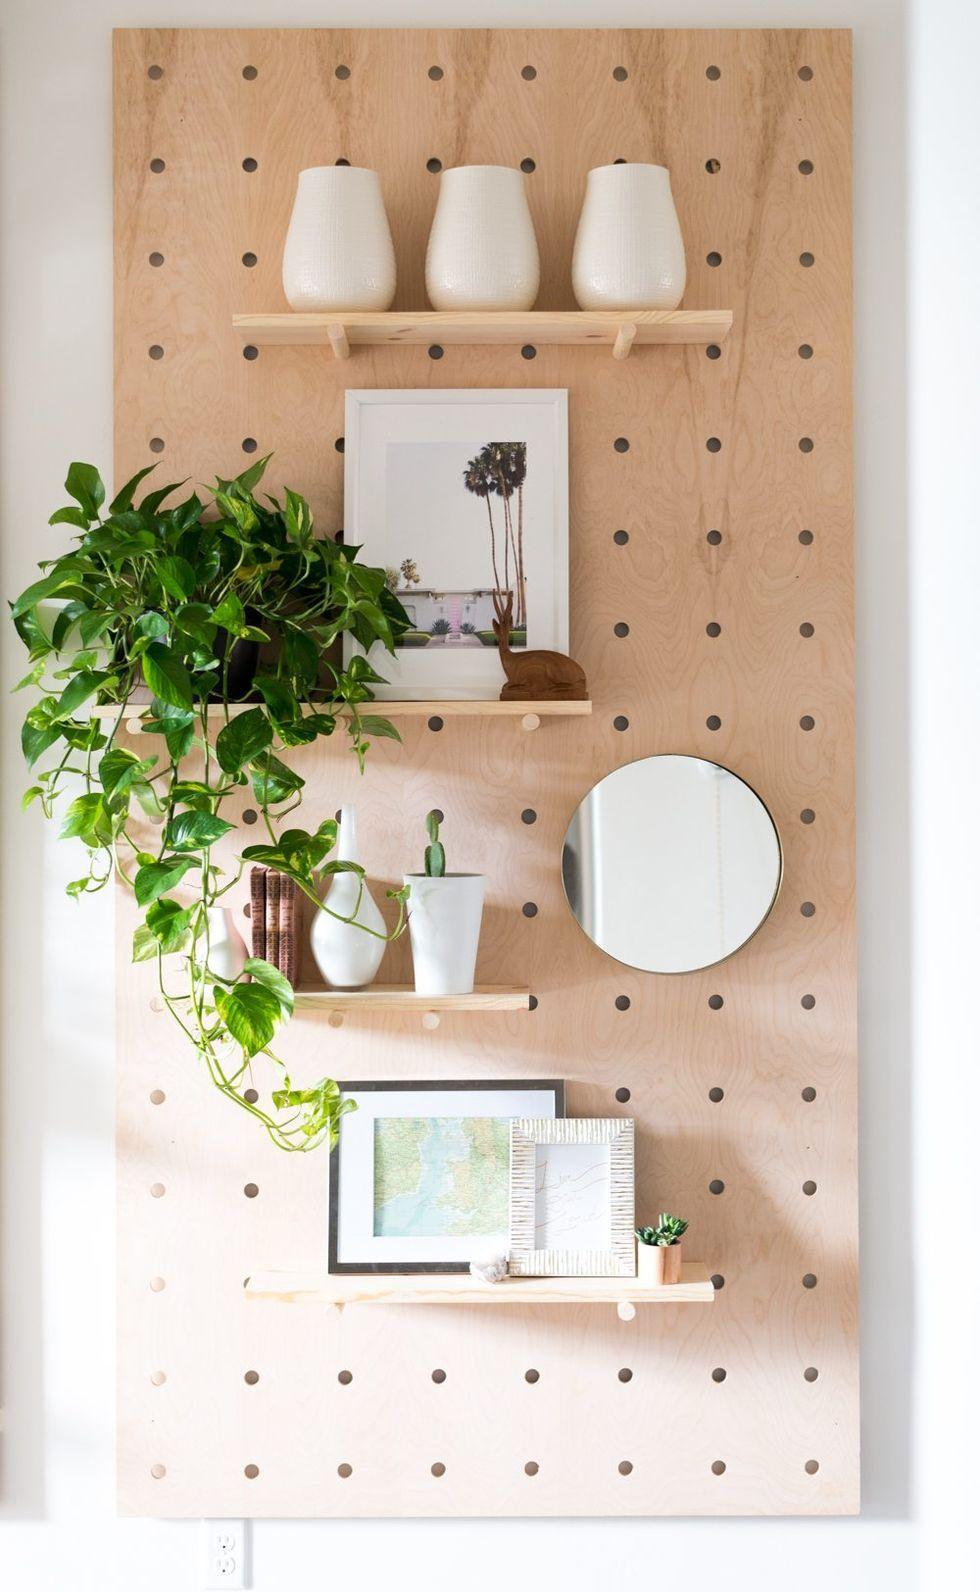 17 Easy Diy Wall Decor Ideas Inspired By Interiors Designers In 2020 Handmade Home Decor Decor Diy Wall Decor